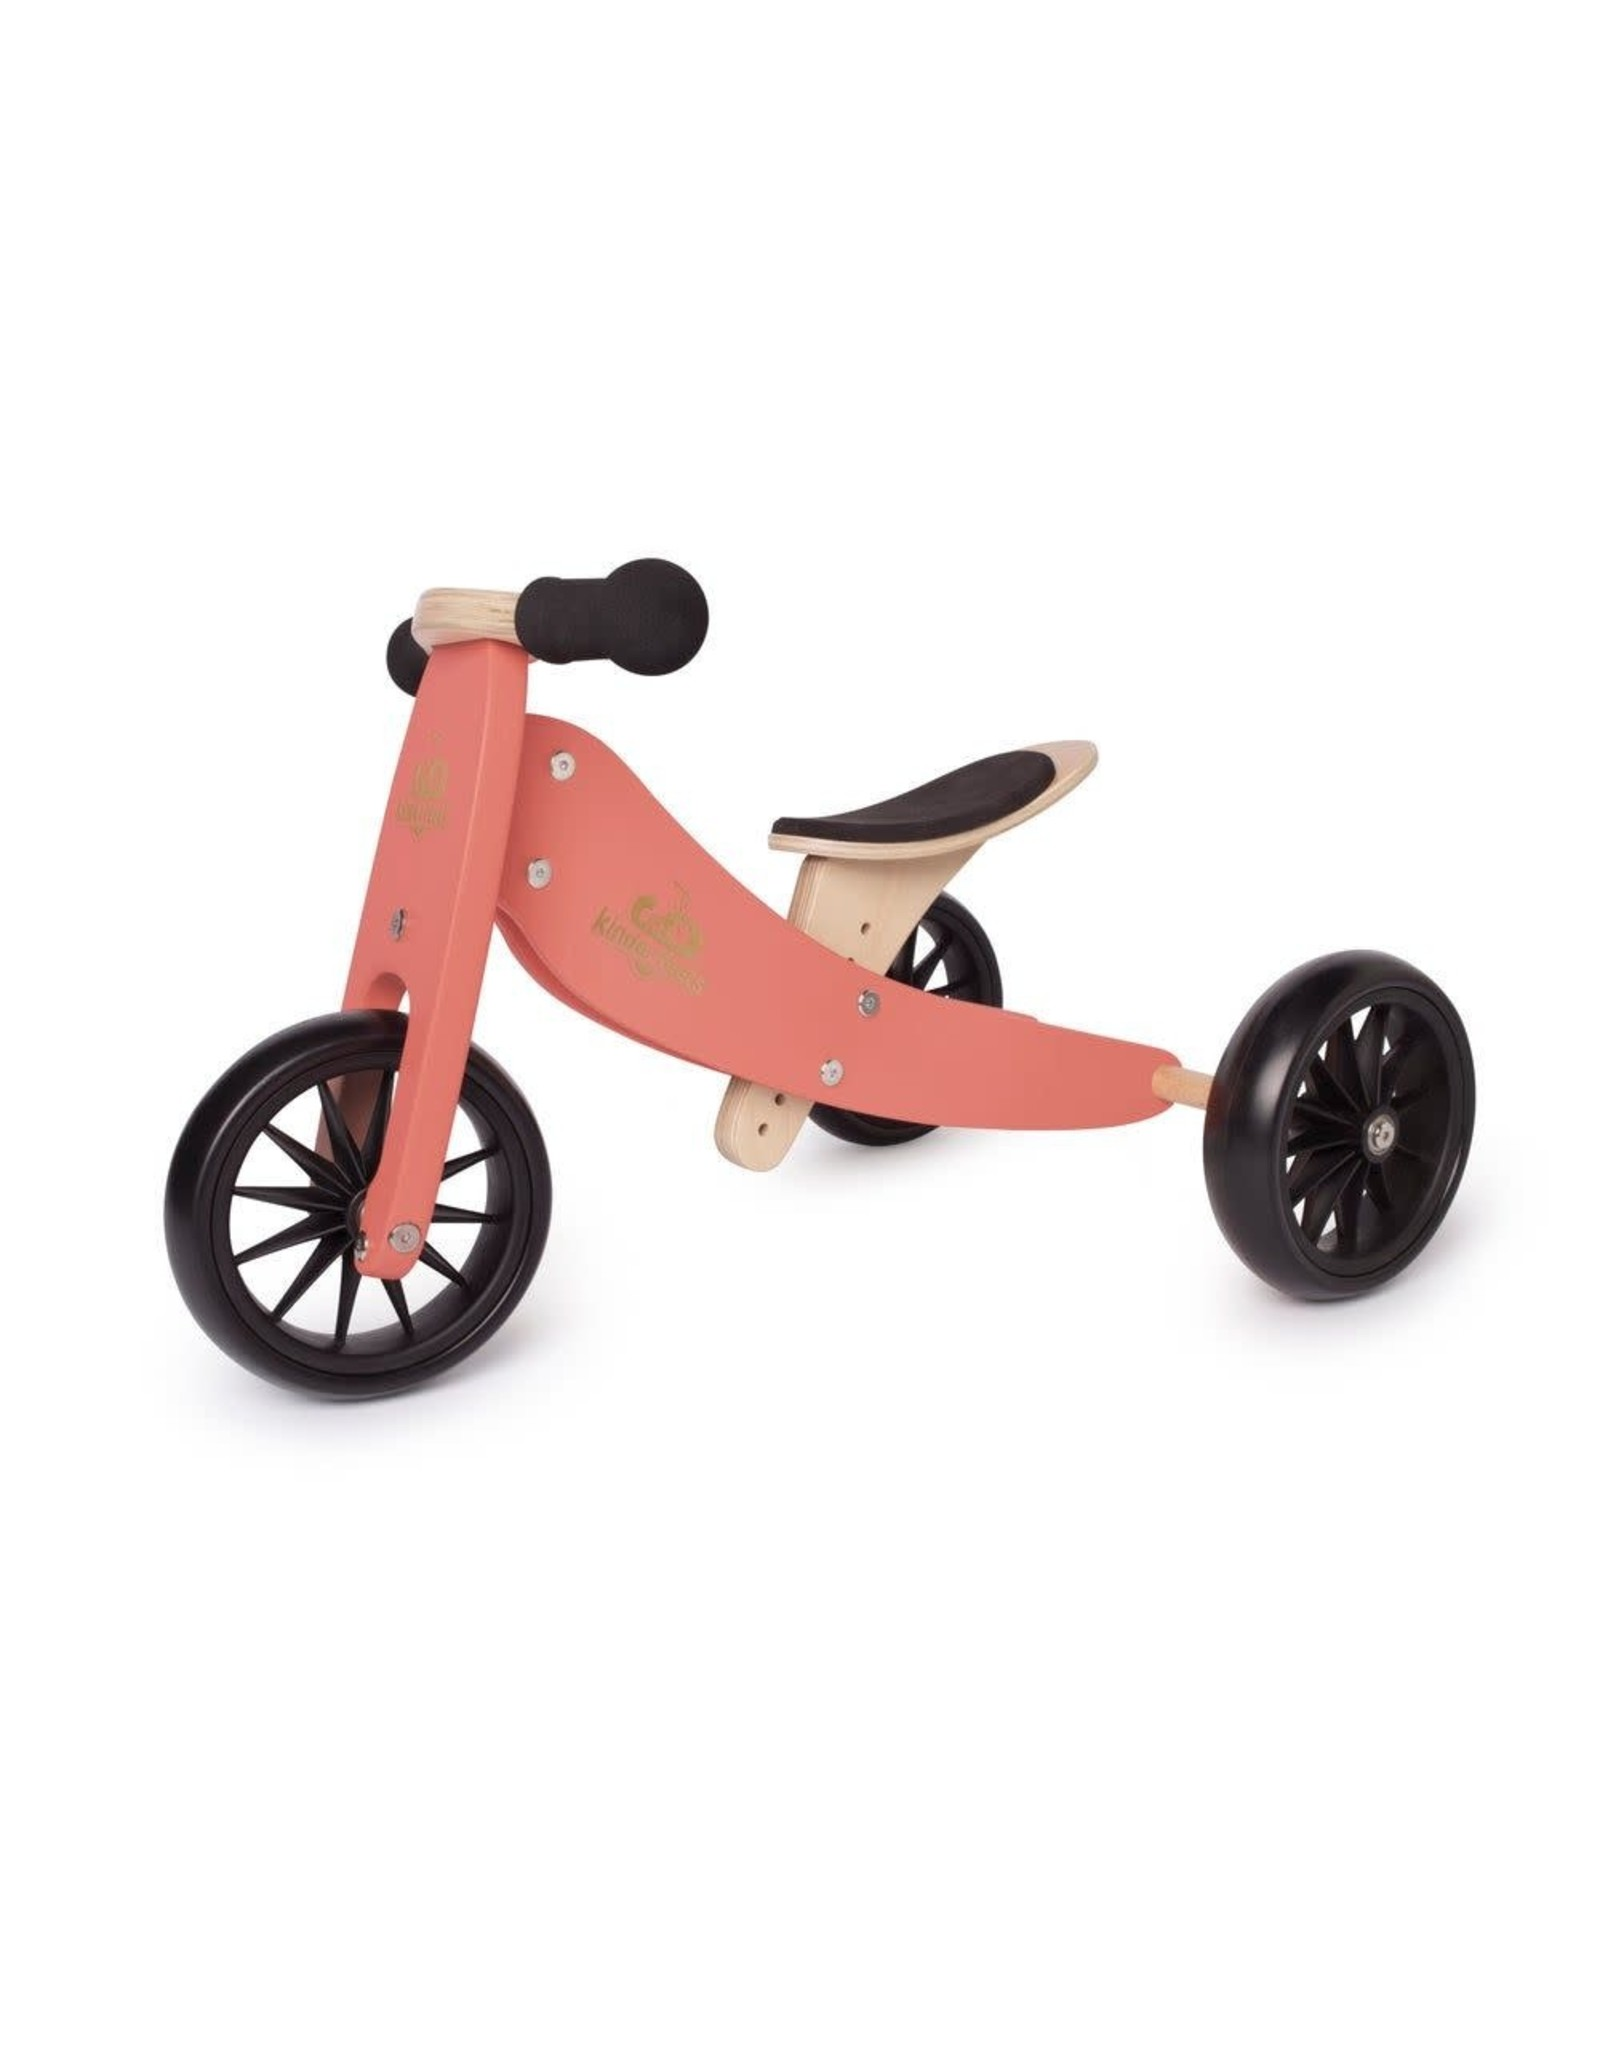 Kinderfeets Kinderfeets Tiny Tot Balance Bike coral